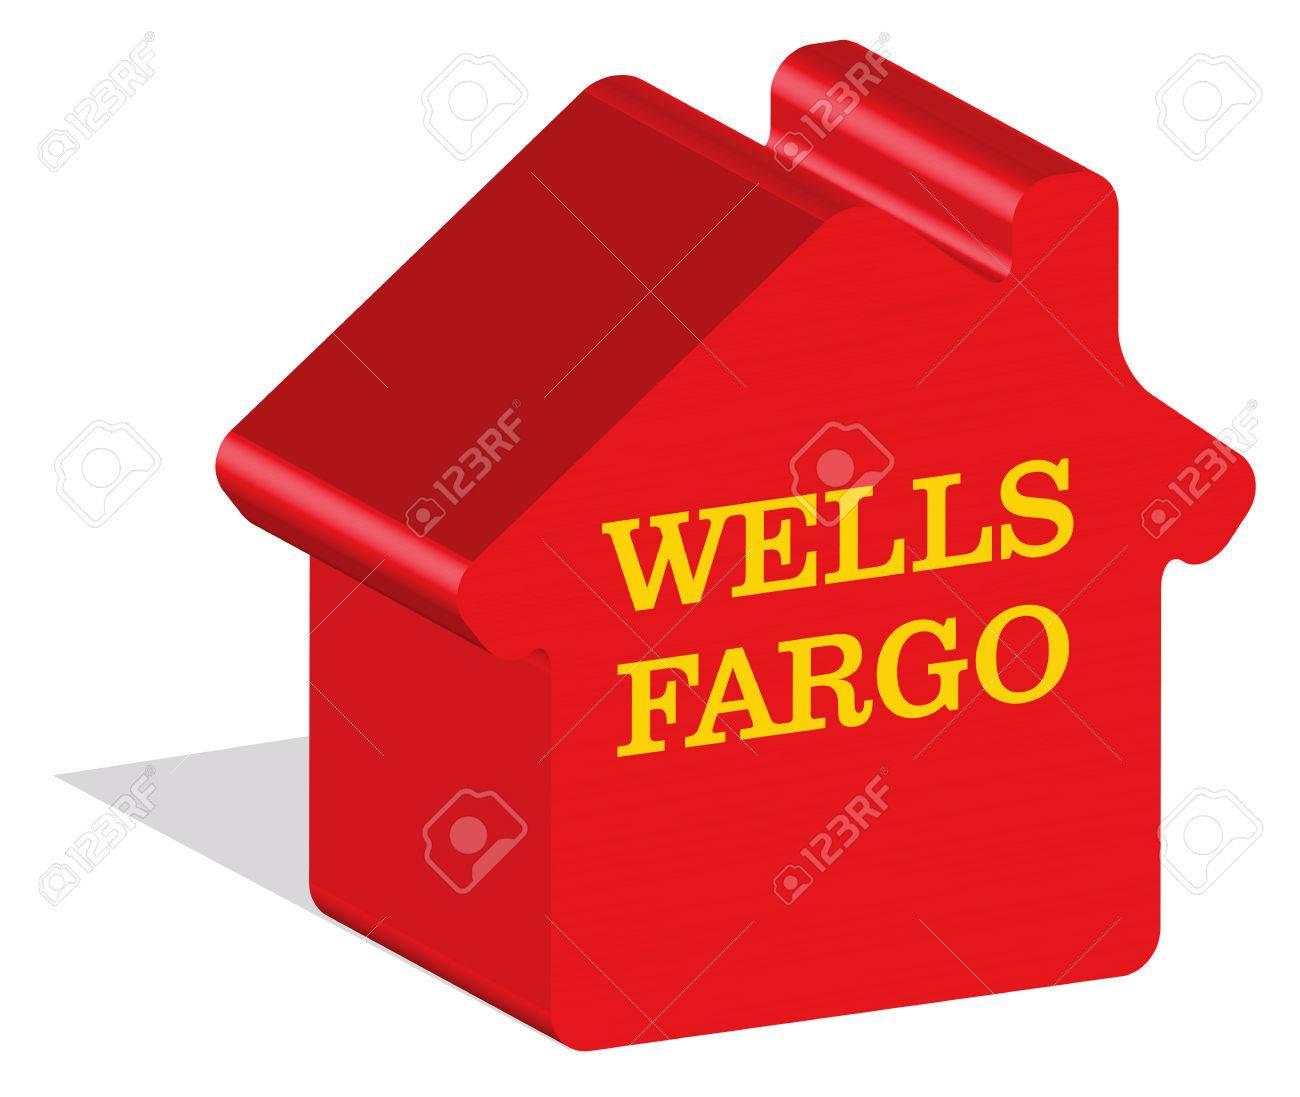 Istanbul Turkey Feb 15 2017 Wells Fargo Logotype In 3d Form